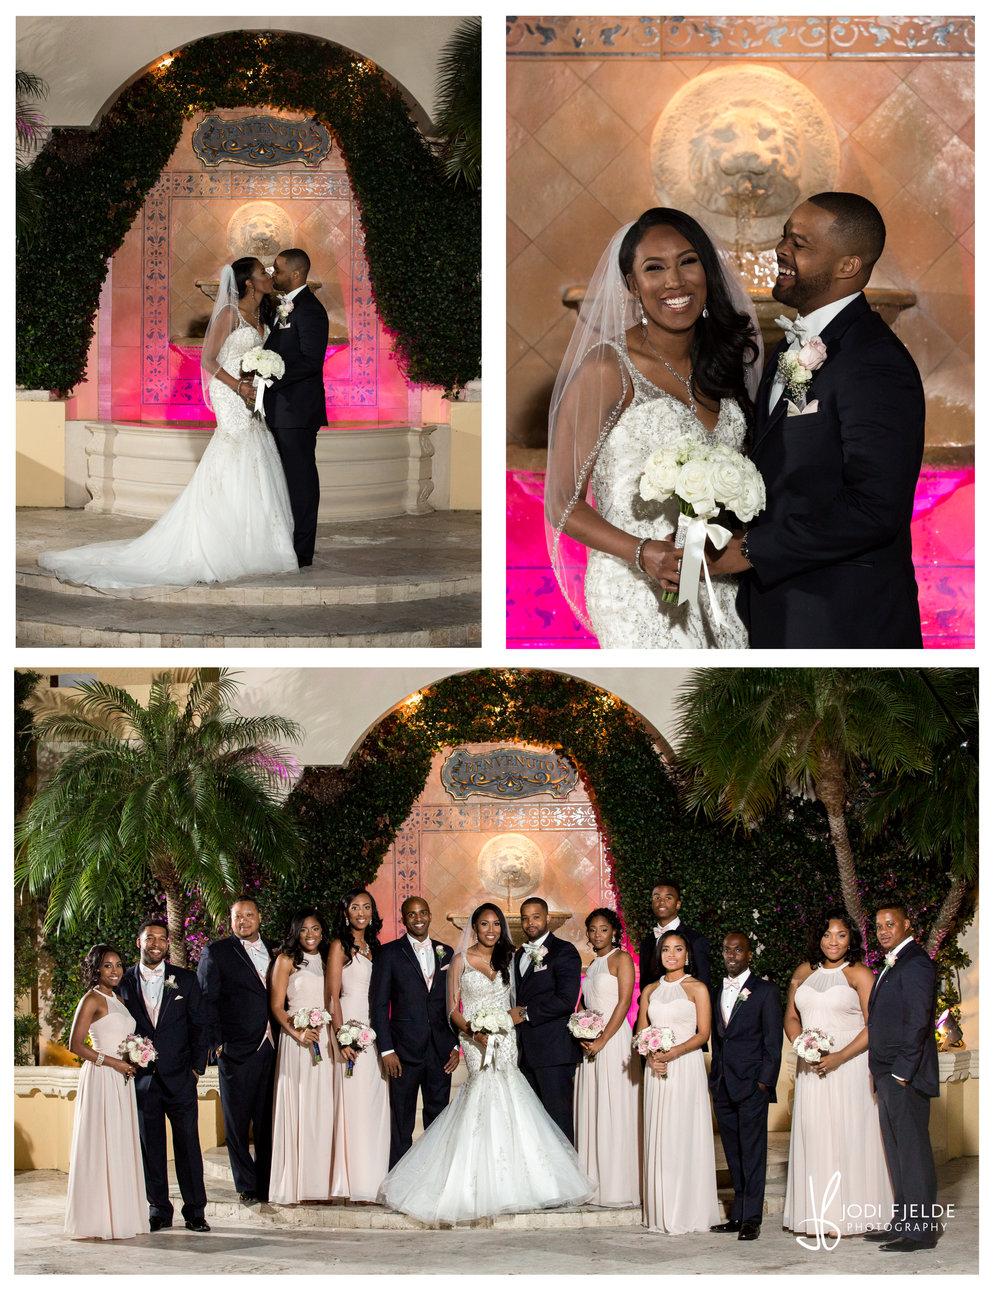 Benvenuto_wedding_Boynton_Beach_Jodi_Fjelde_Photography_Nikki_Otis_married_18.jpg